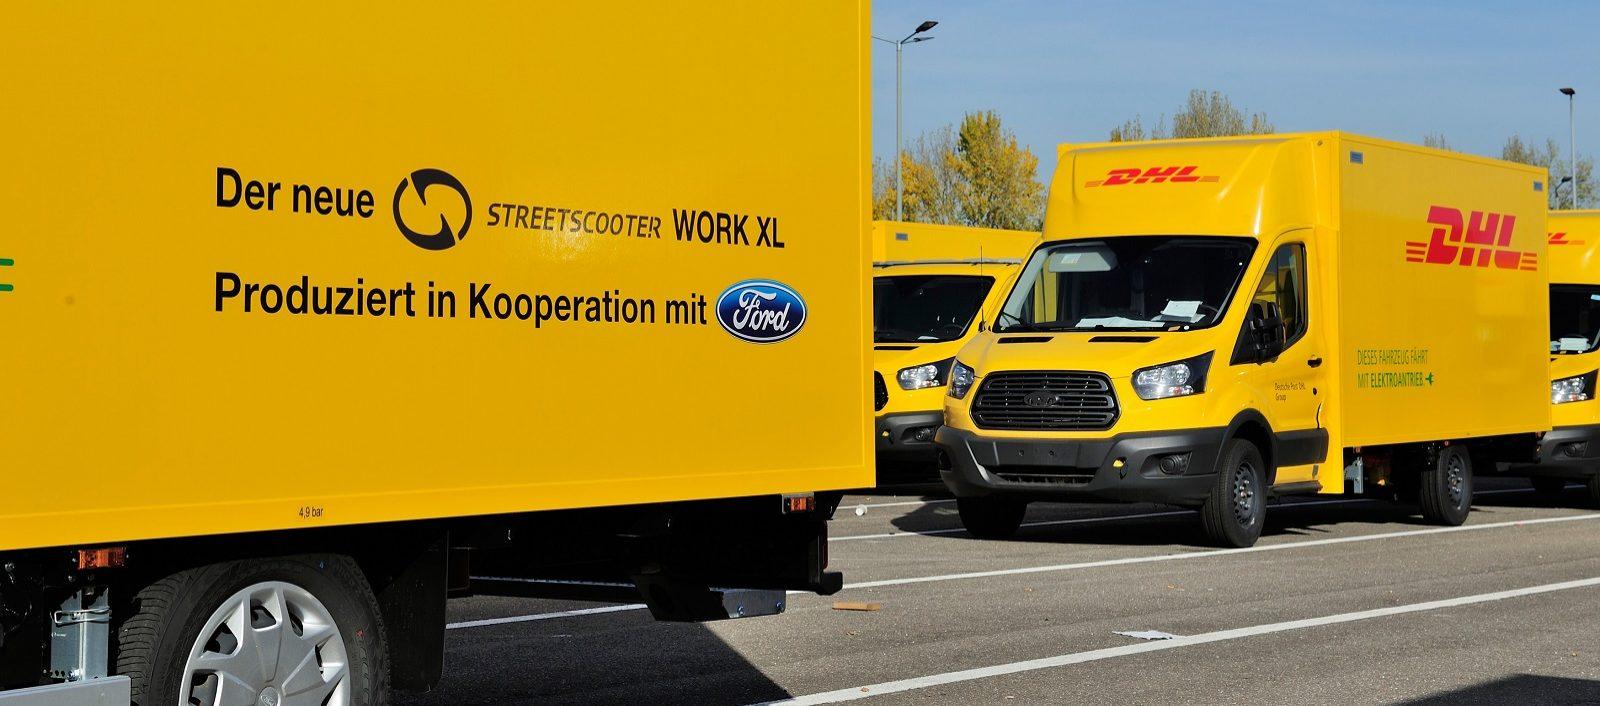 Ford Start Productie Van Elektrische Streetscooter Work Xl